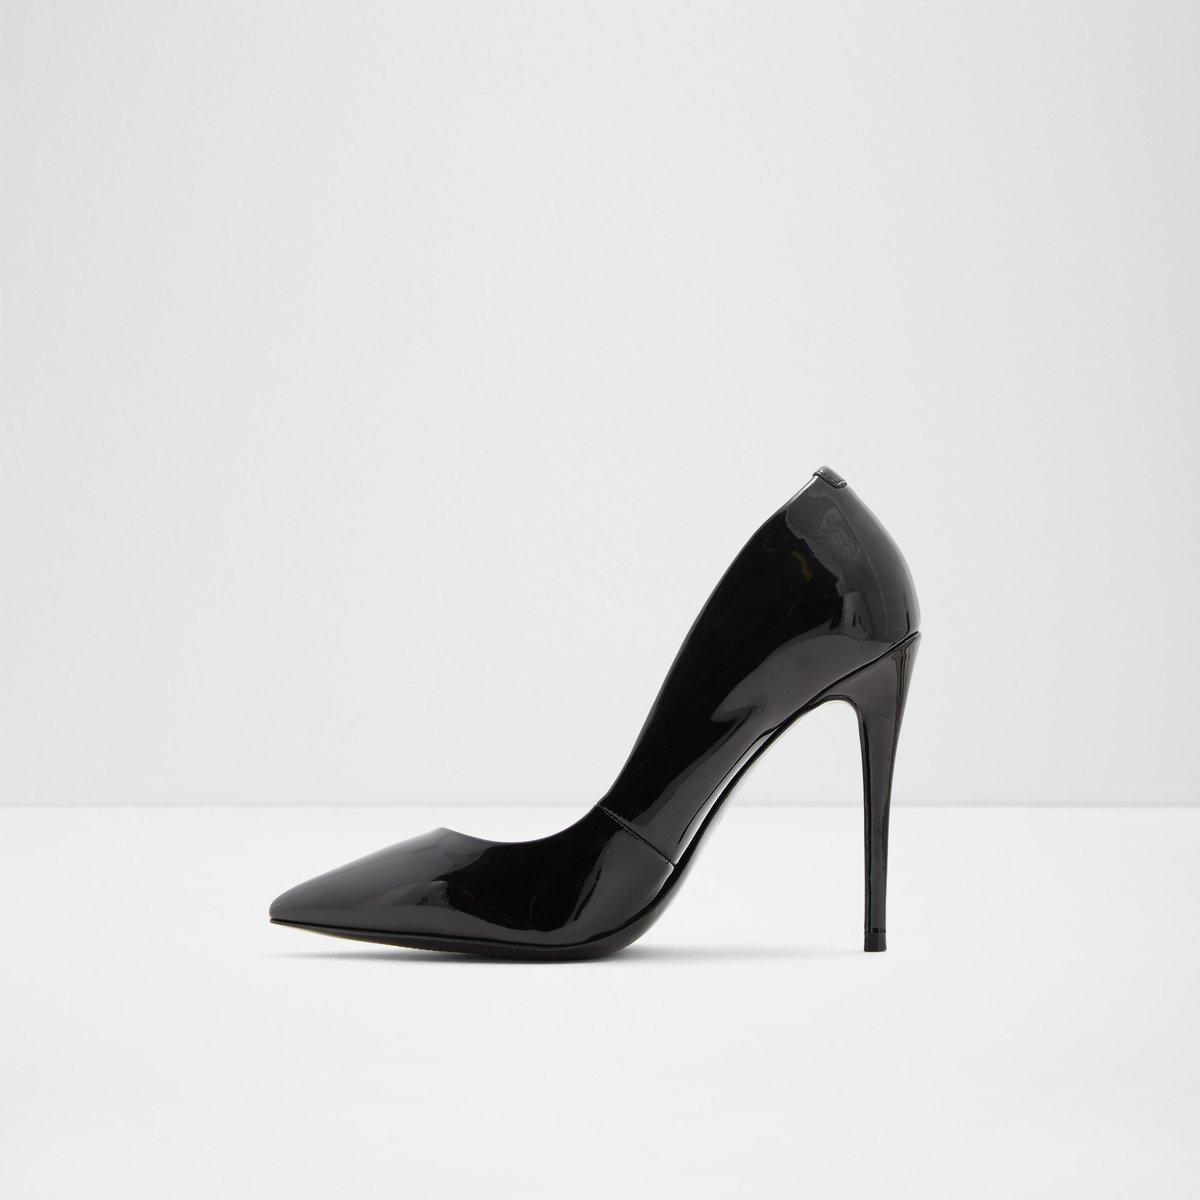 e82551f4ee0 Stessy  Black Patent Women s Heels